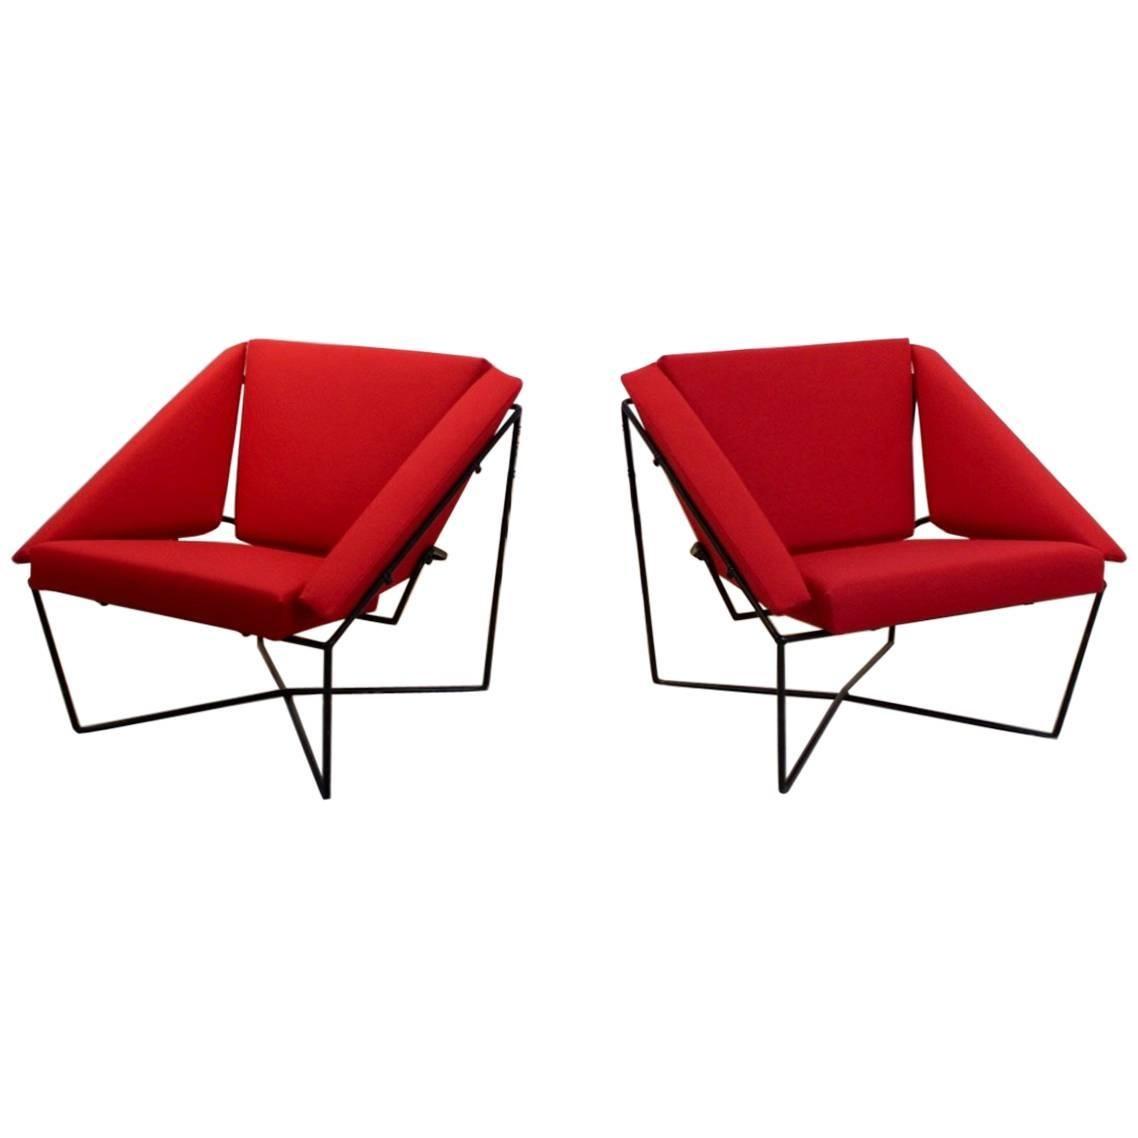 Amazing Sculptural Van Speyk Easy Chair by Rob Eckhardt, Holland